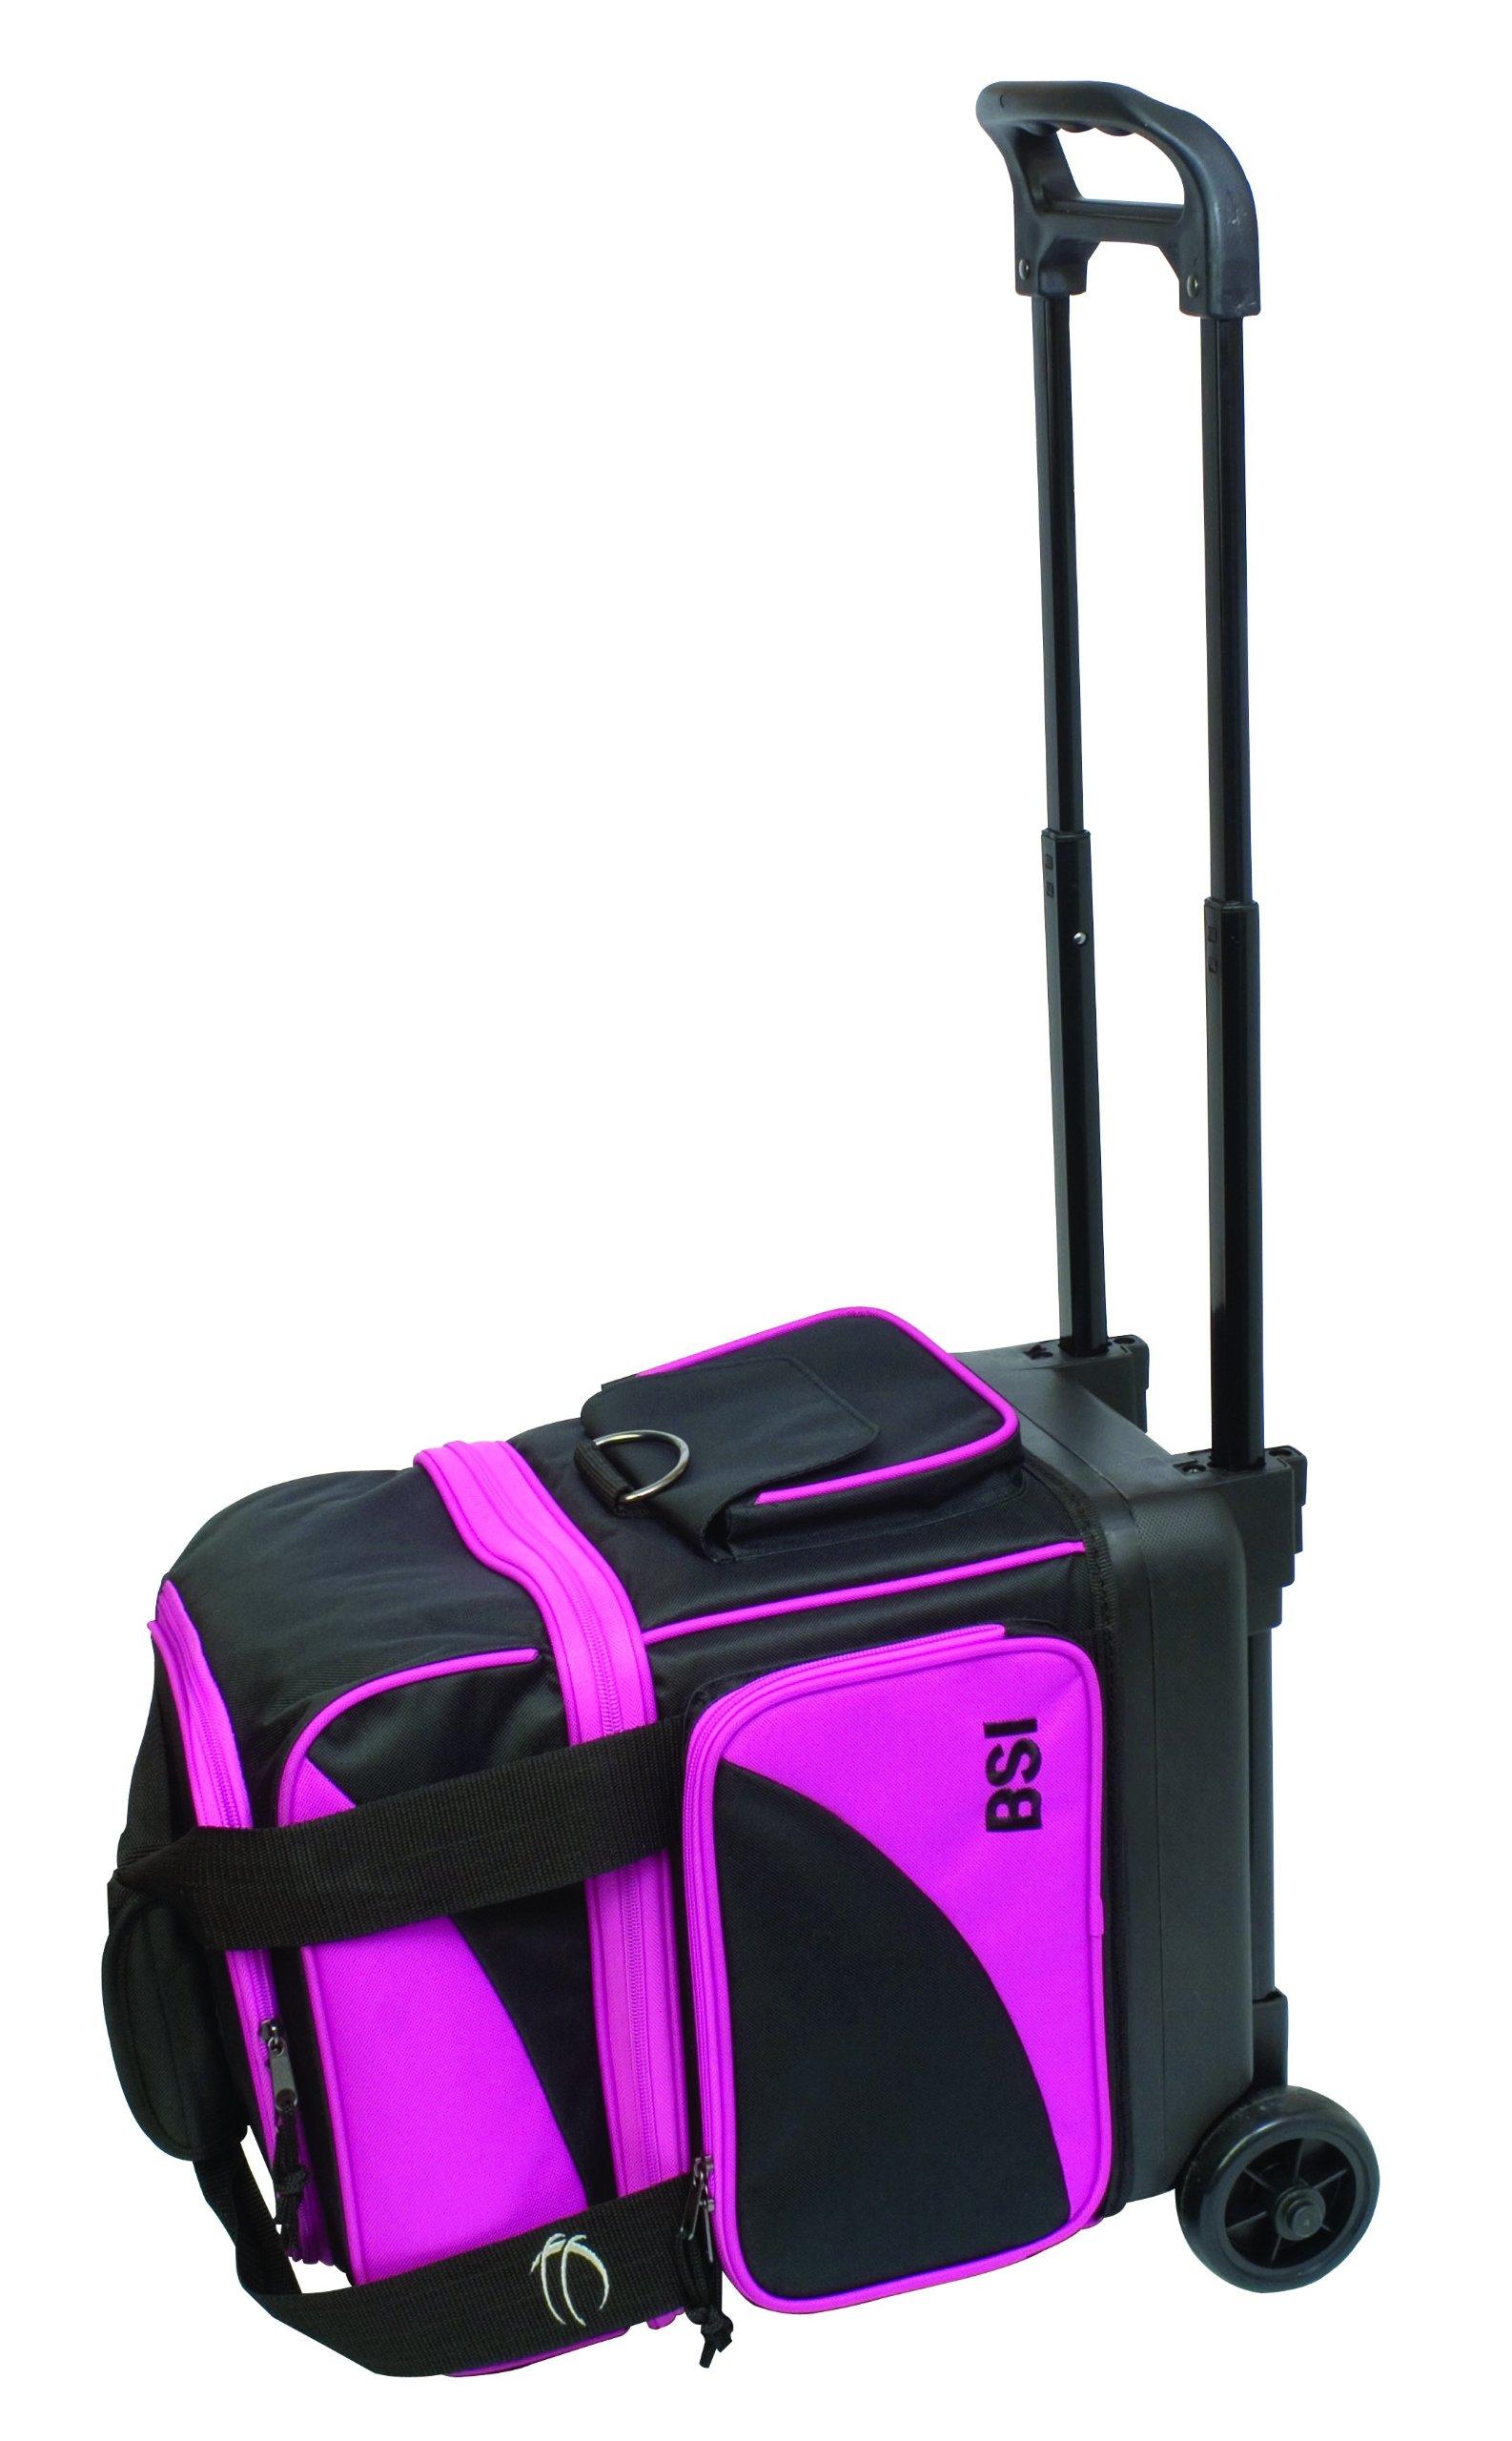 BSI Single Ball Roller Bag, Black/Pink